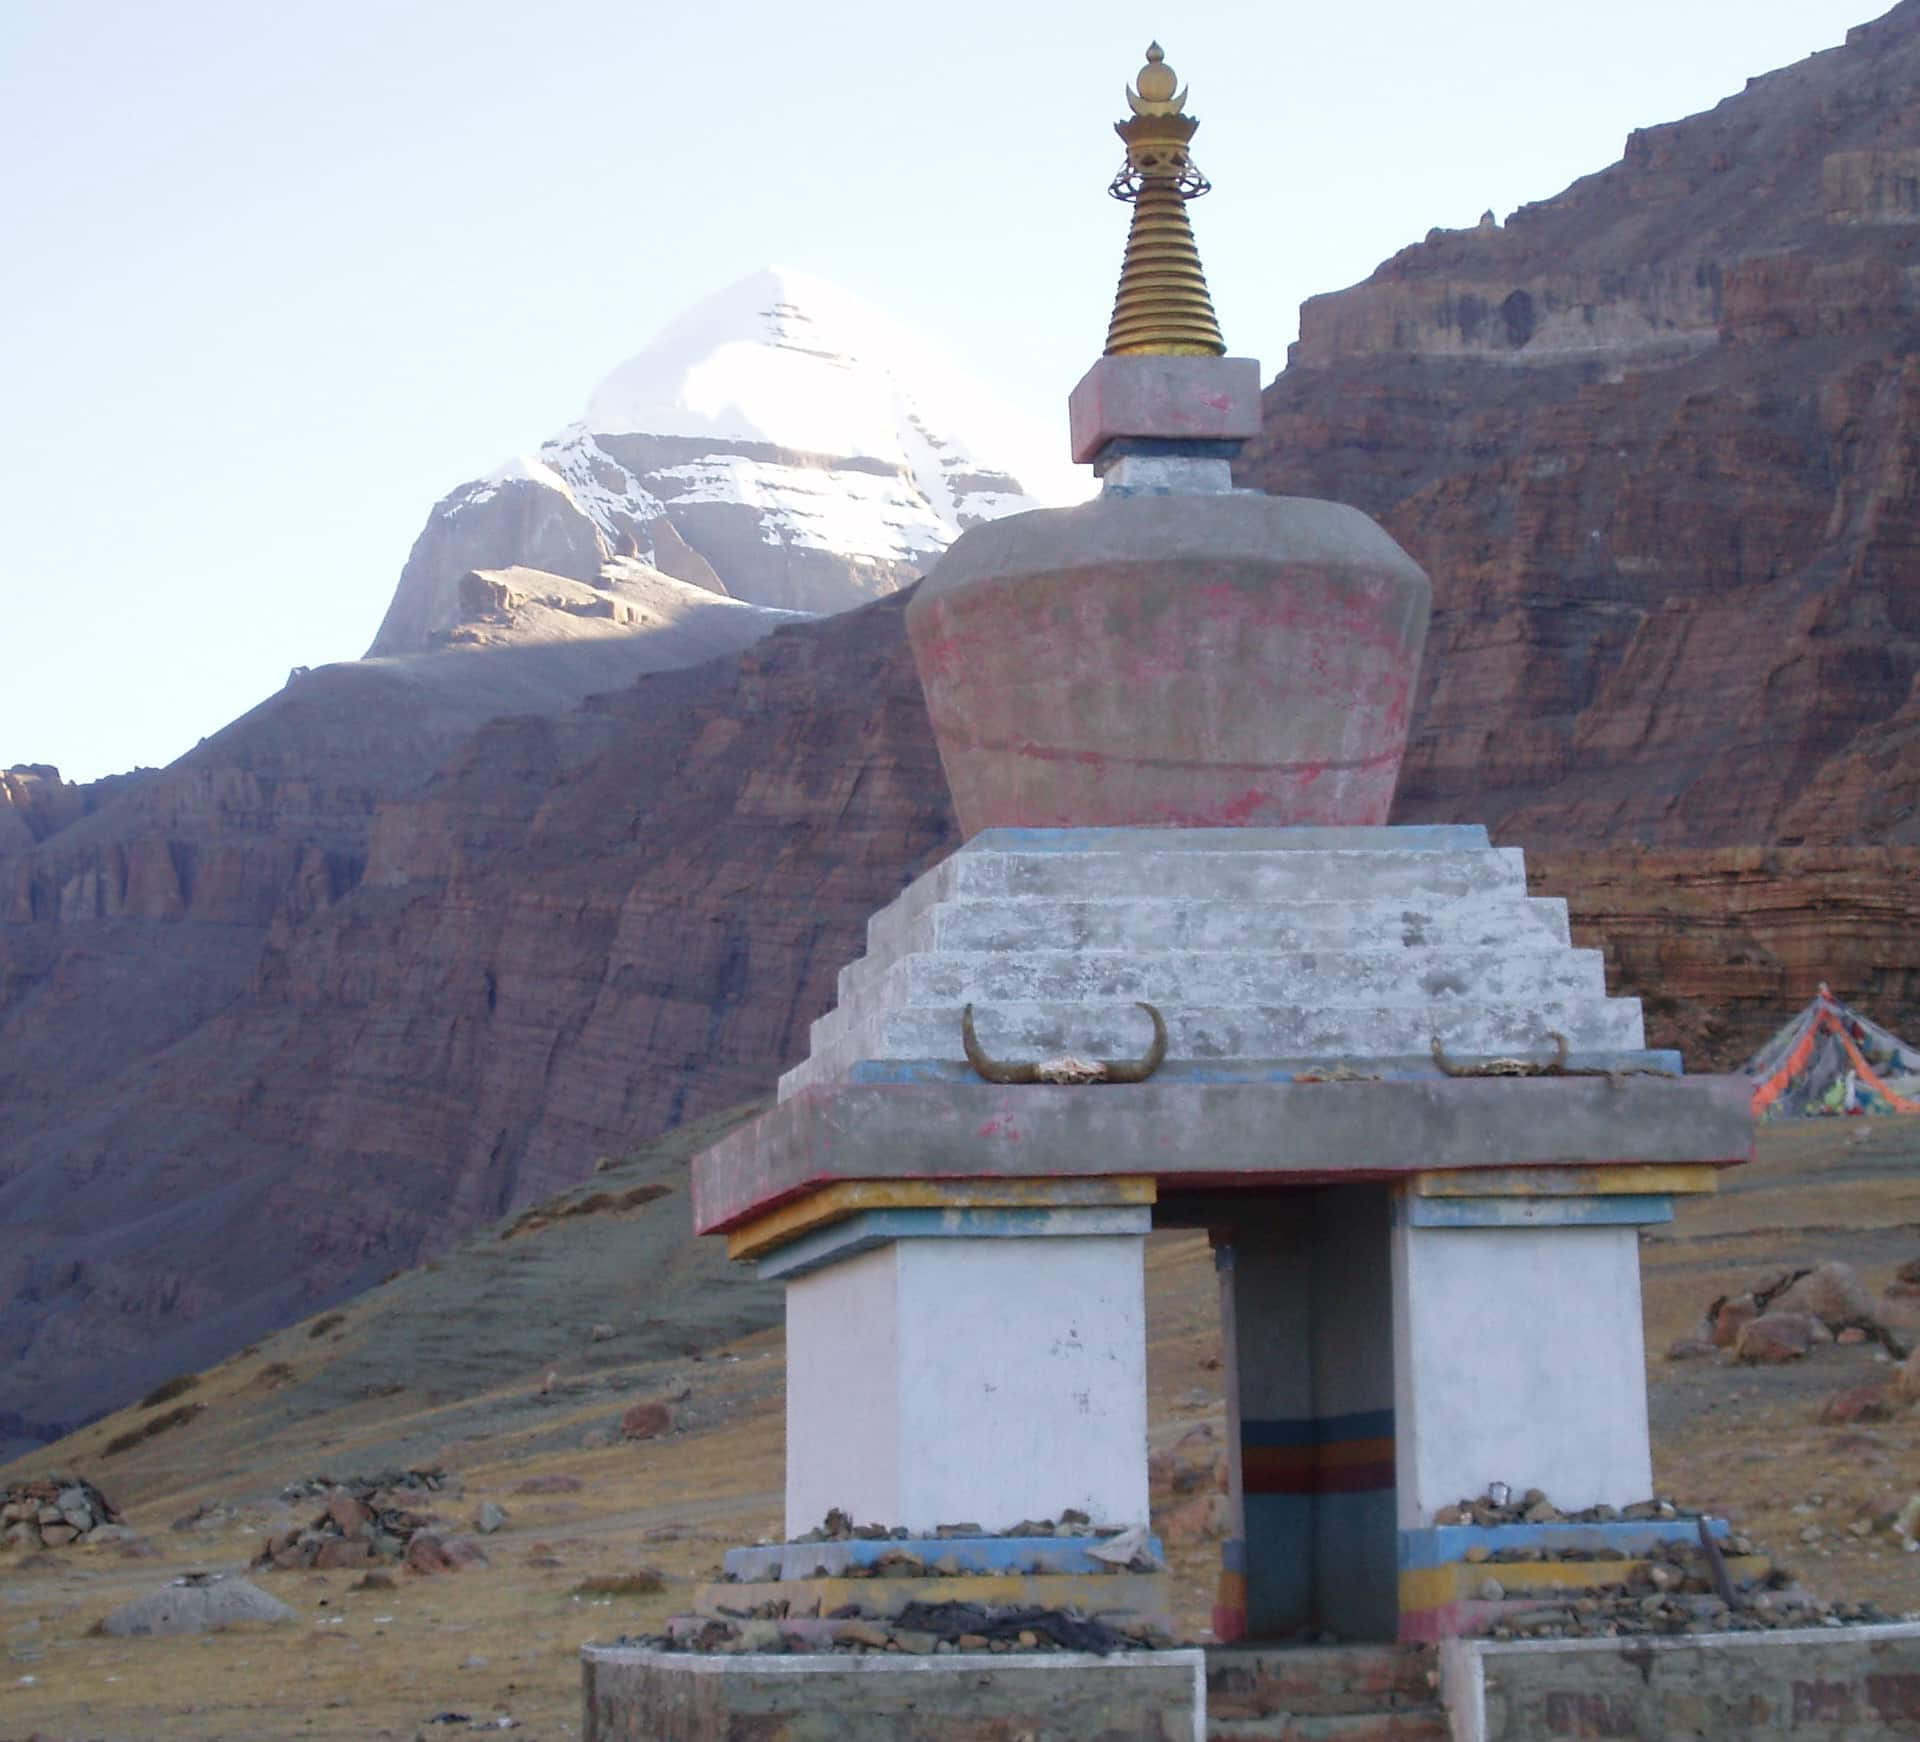 Palver Ndurid Kailash Il Vagabund Reisidvagabund Reisid # Muebles Kiona Santander